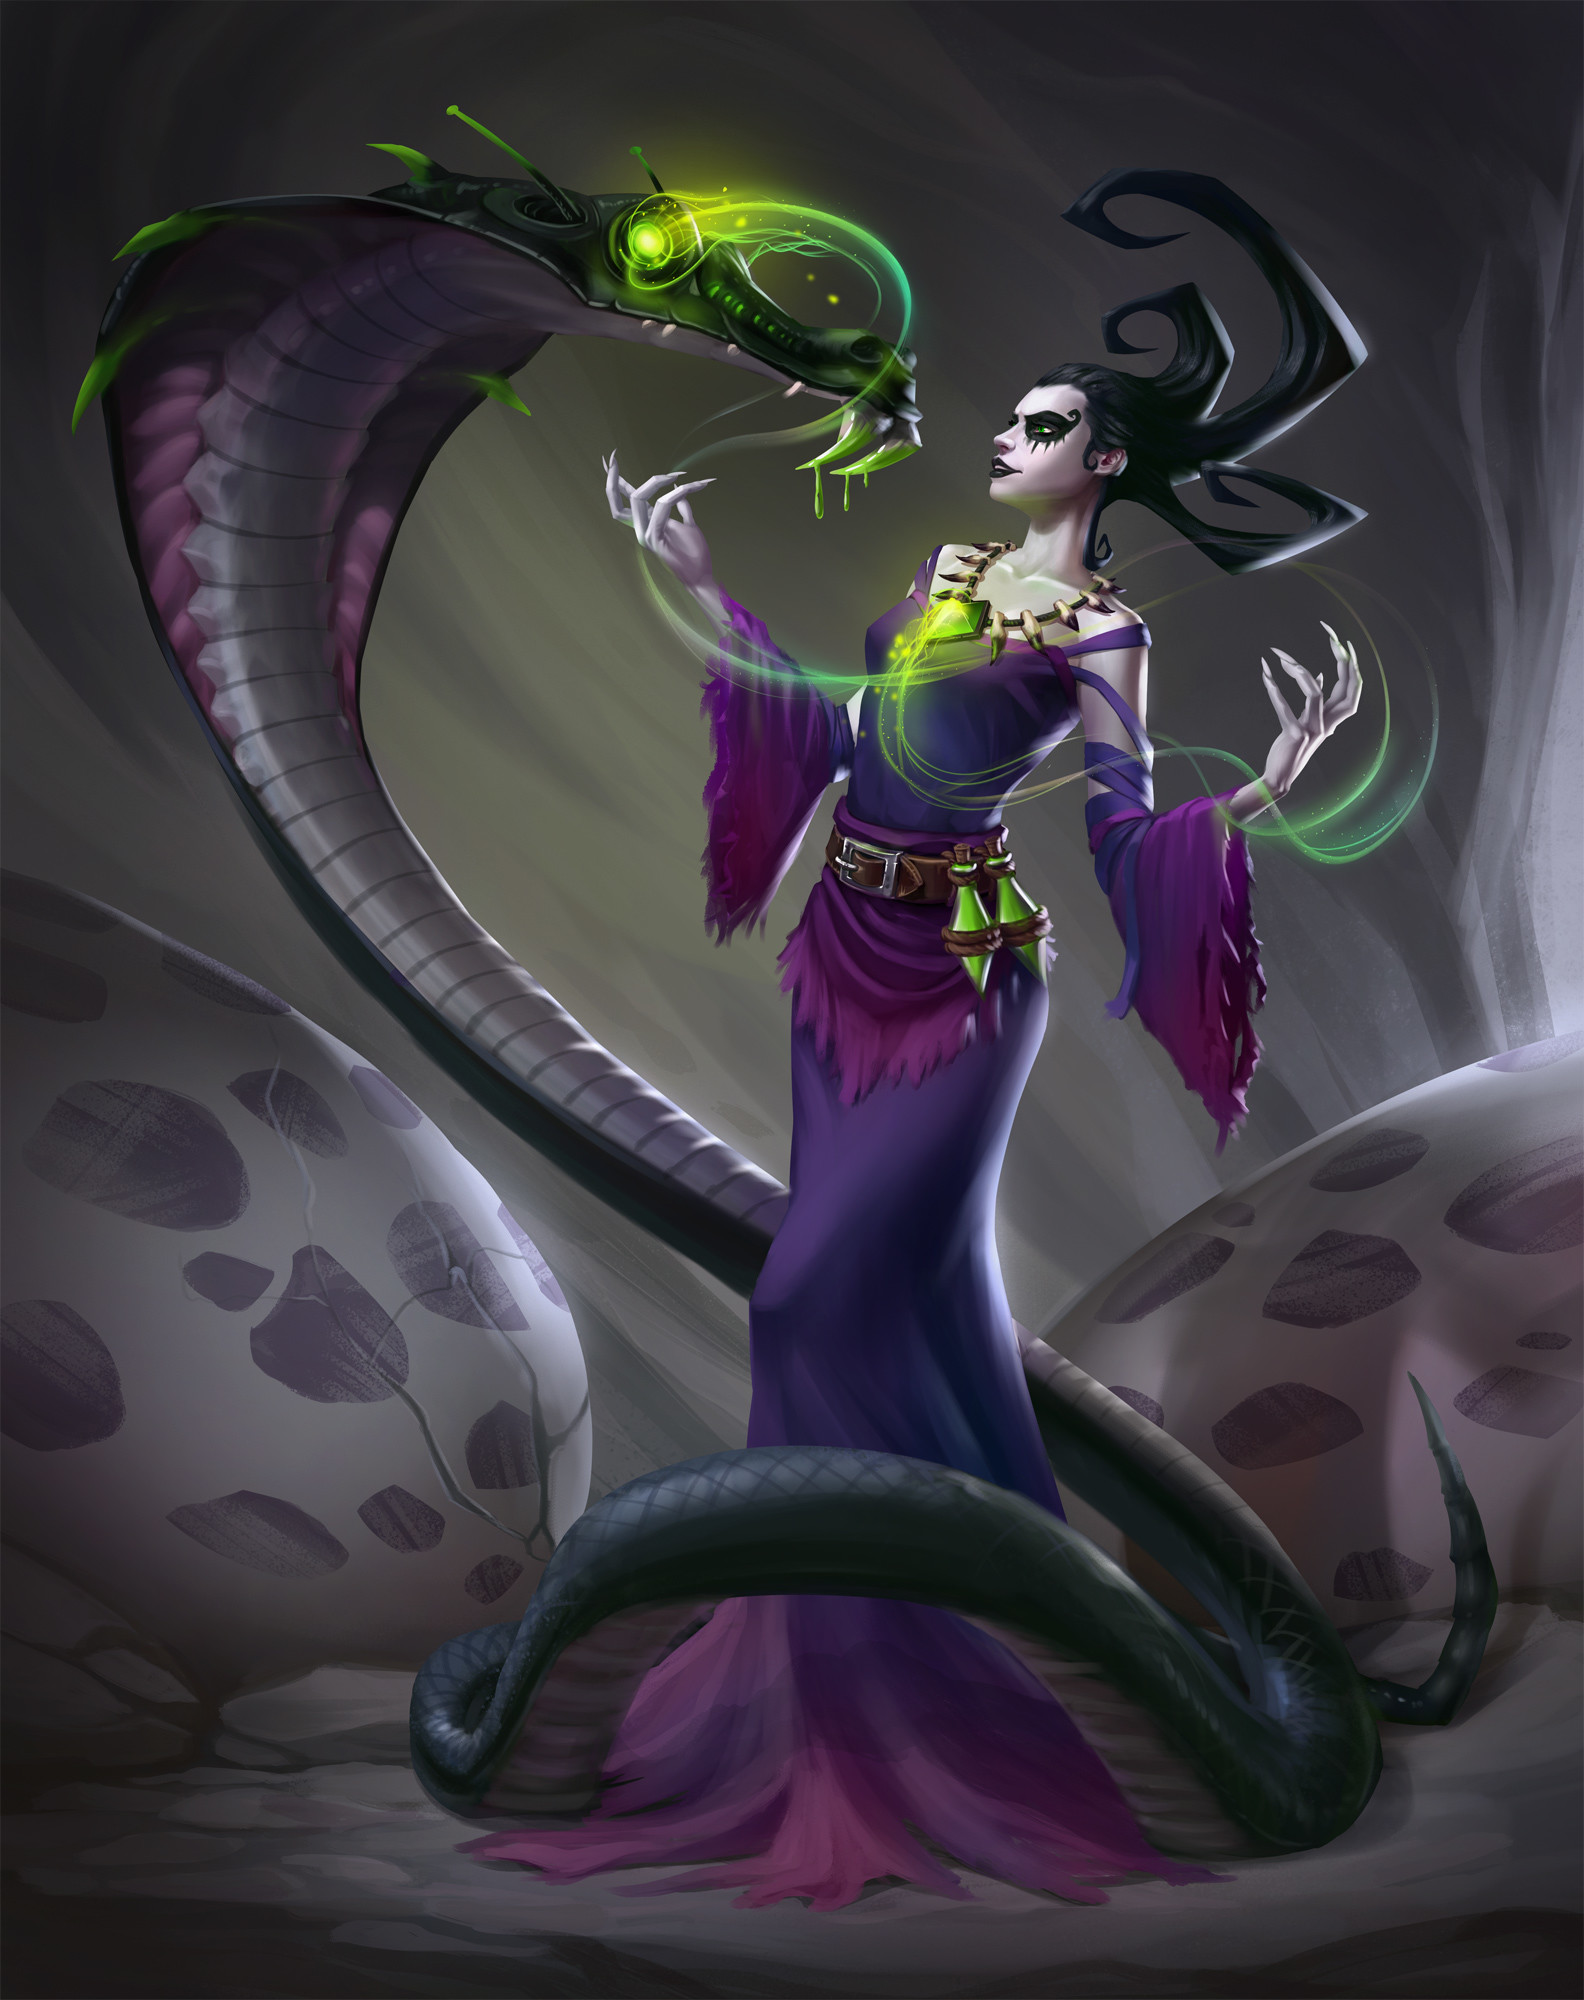 Jonas petrauskas day53 evil venom orgnl